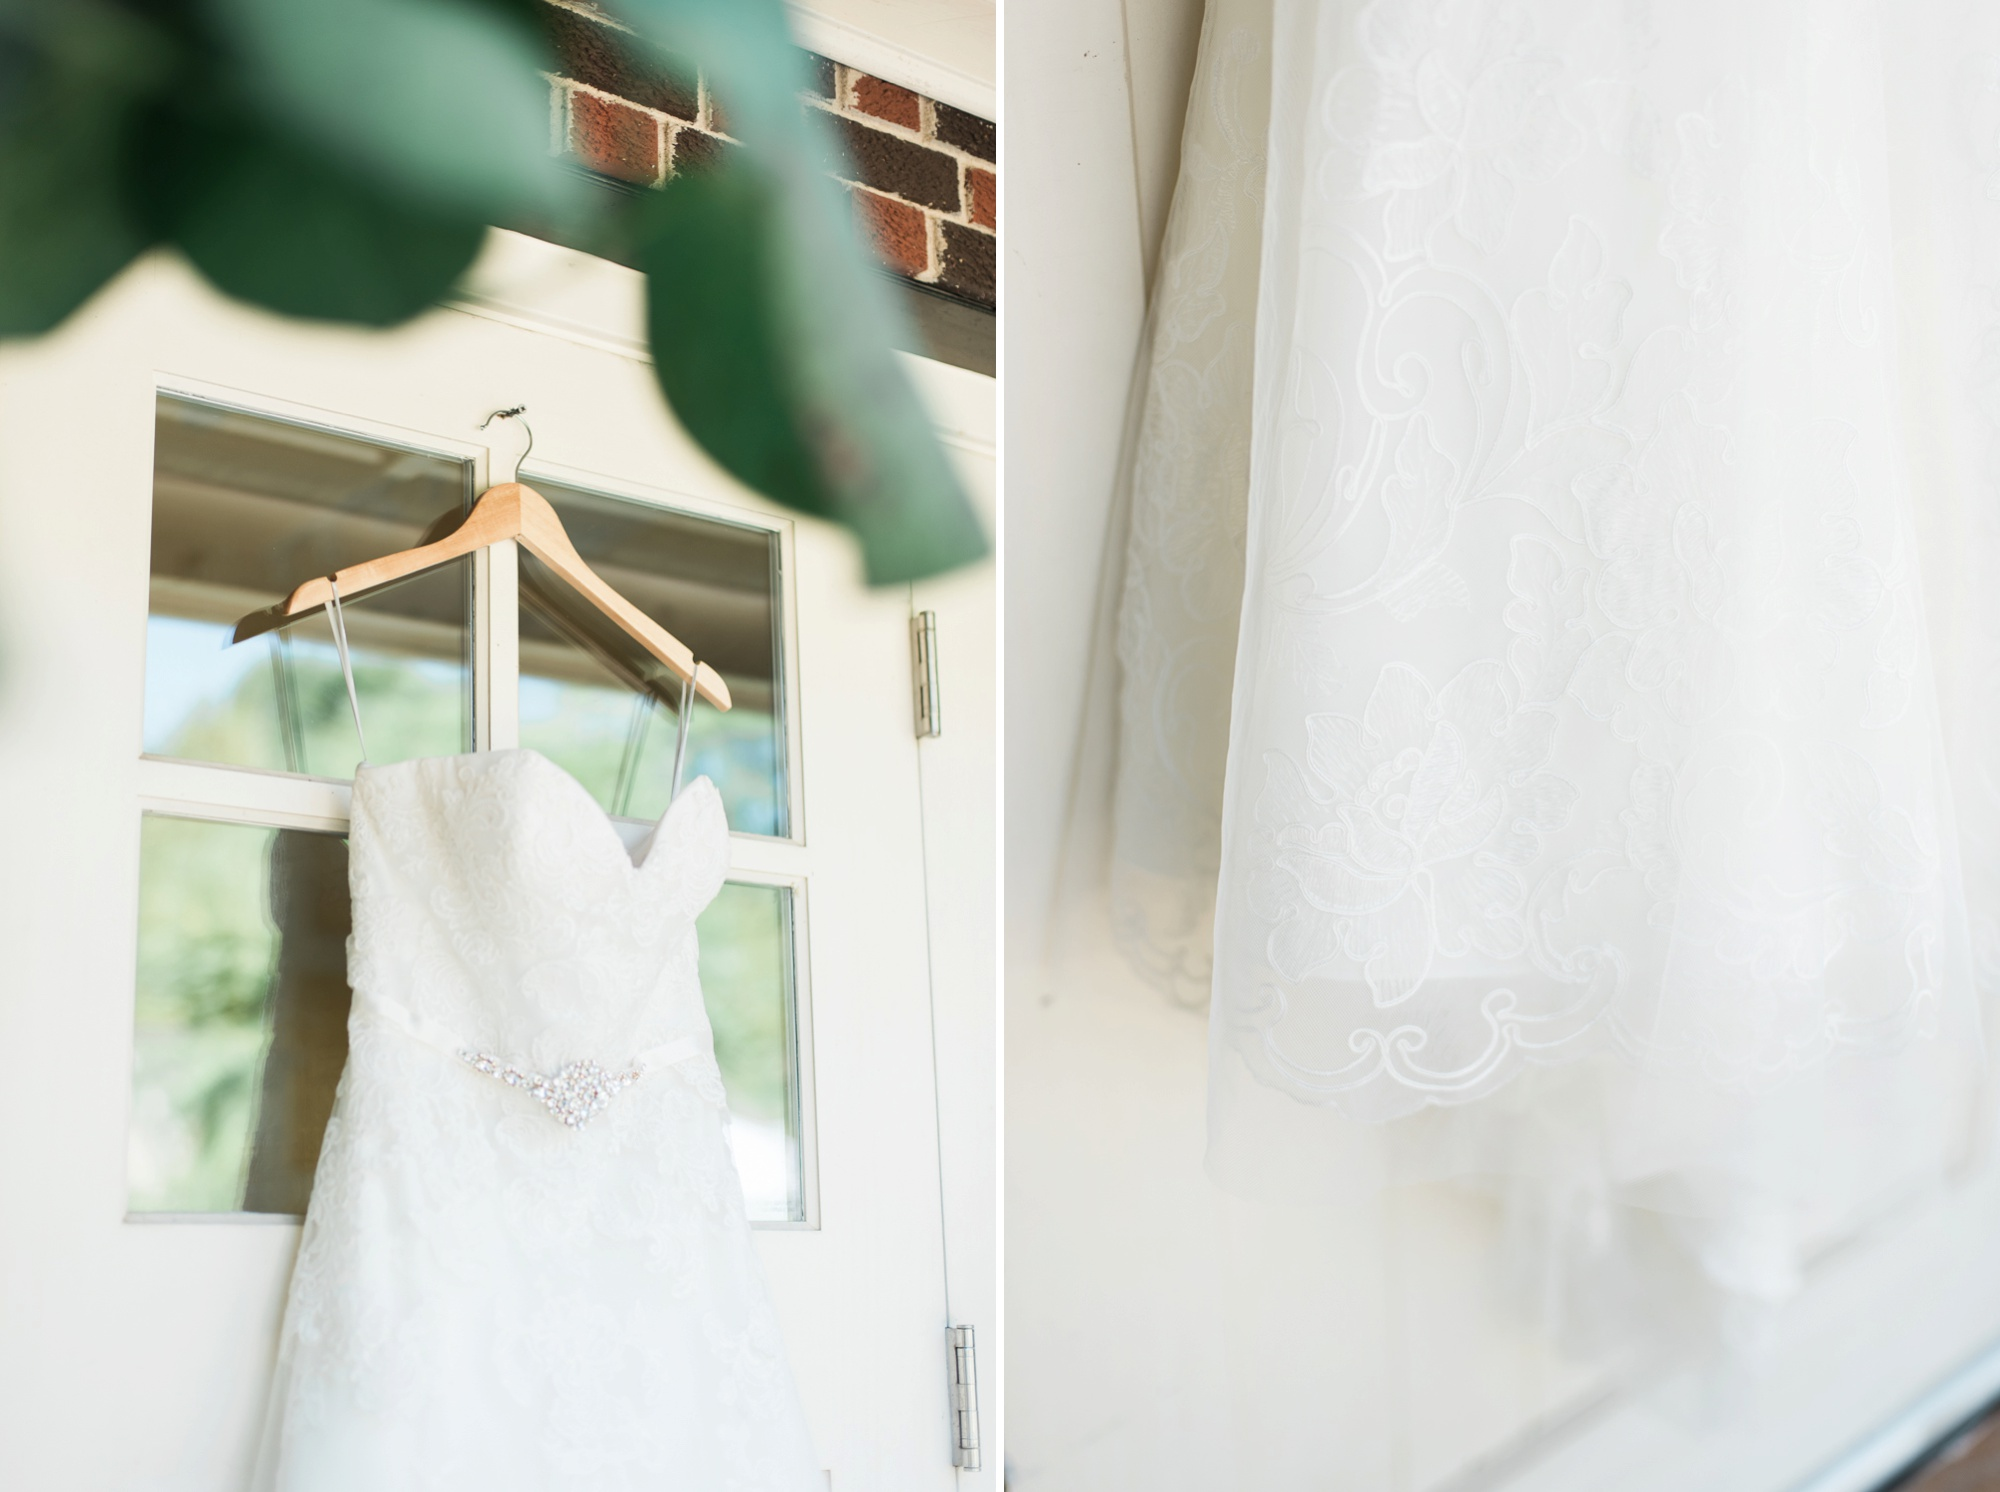 wells-barn-wedding-at-franklin-park-conservatory-12.jpg